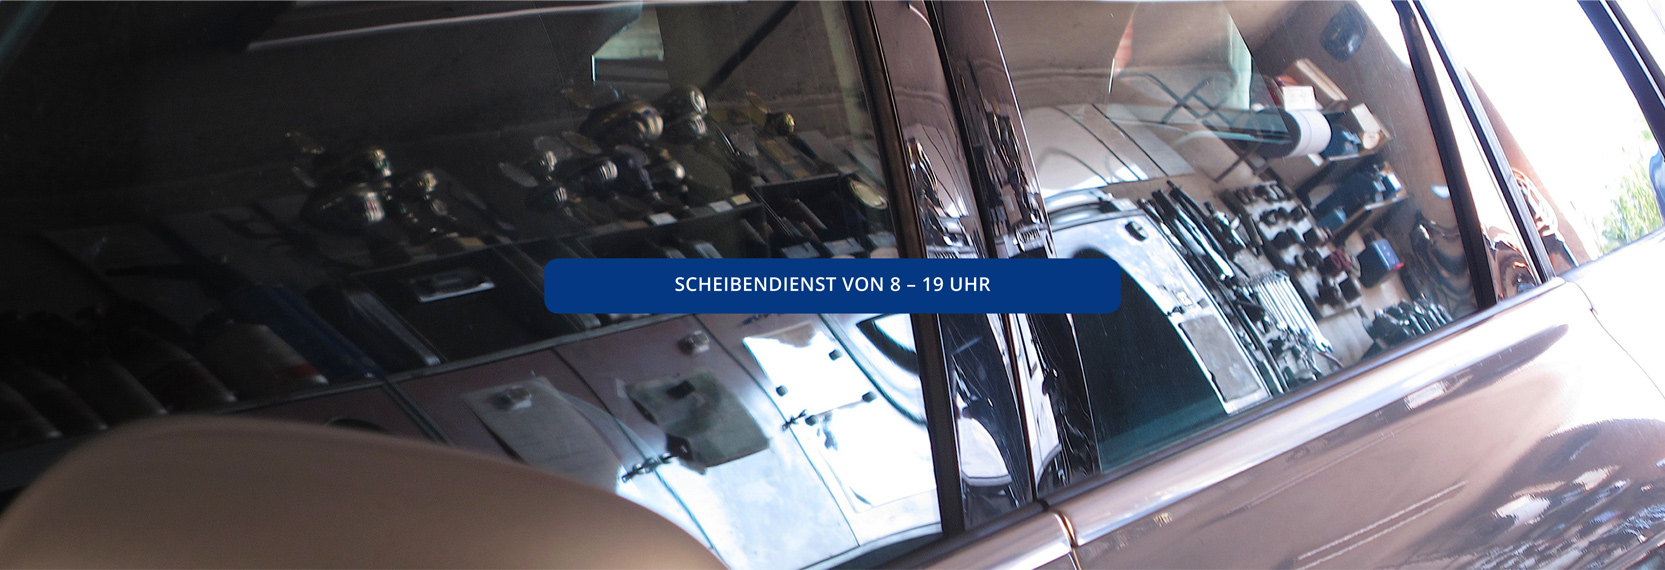 Kfz Werkstatt Lochmüller 3